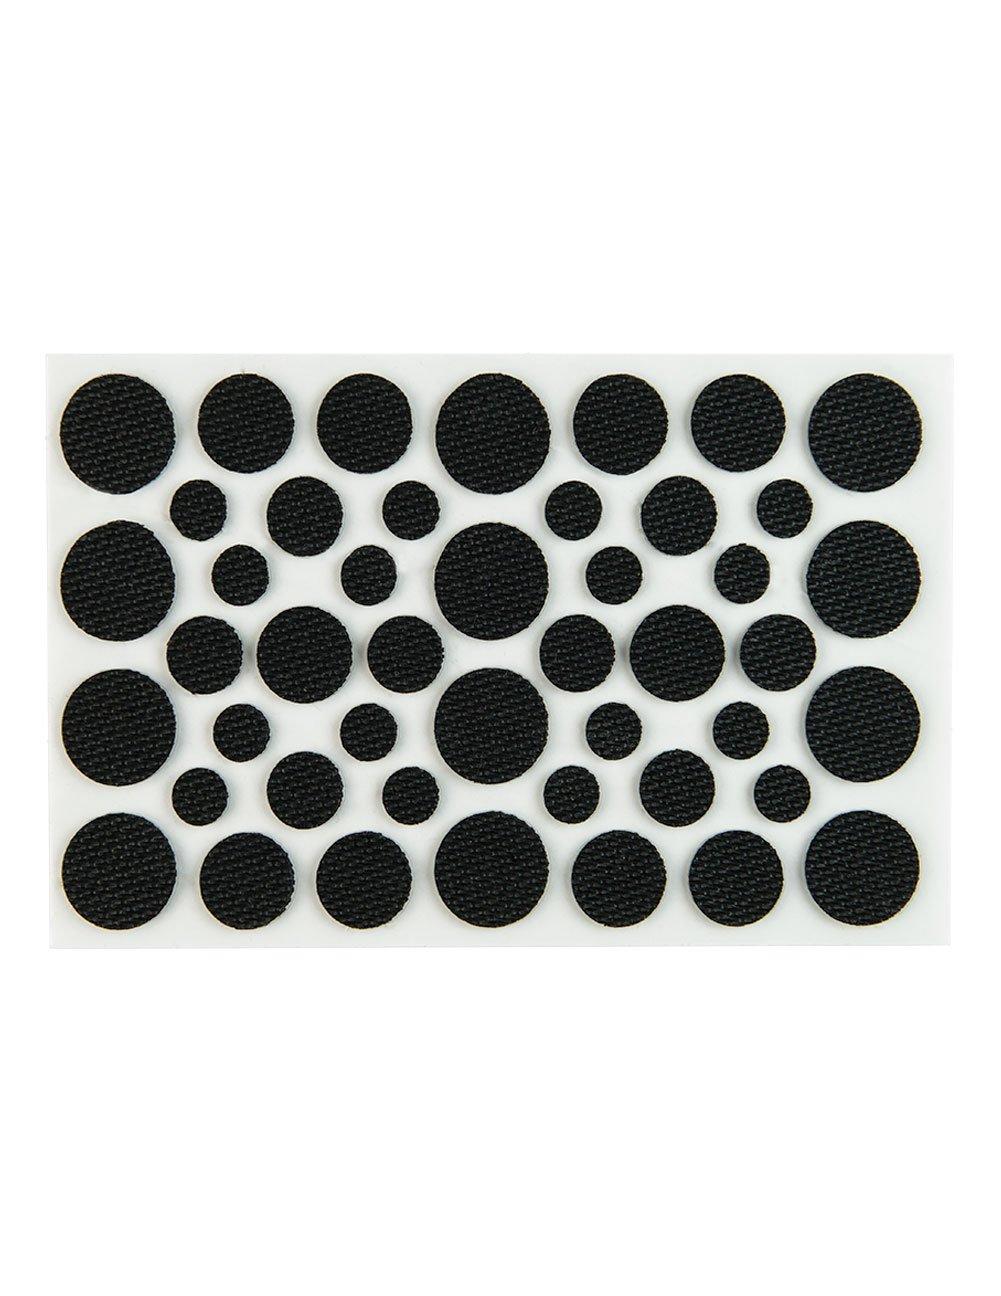 Light Duty Non Slip Rubber Protector Pads - 10 Sheets (46 Pcs/sheet)